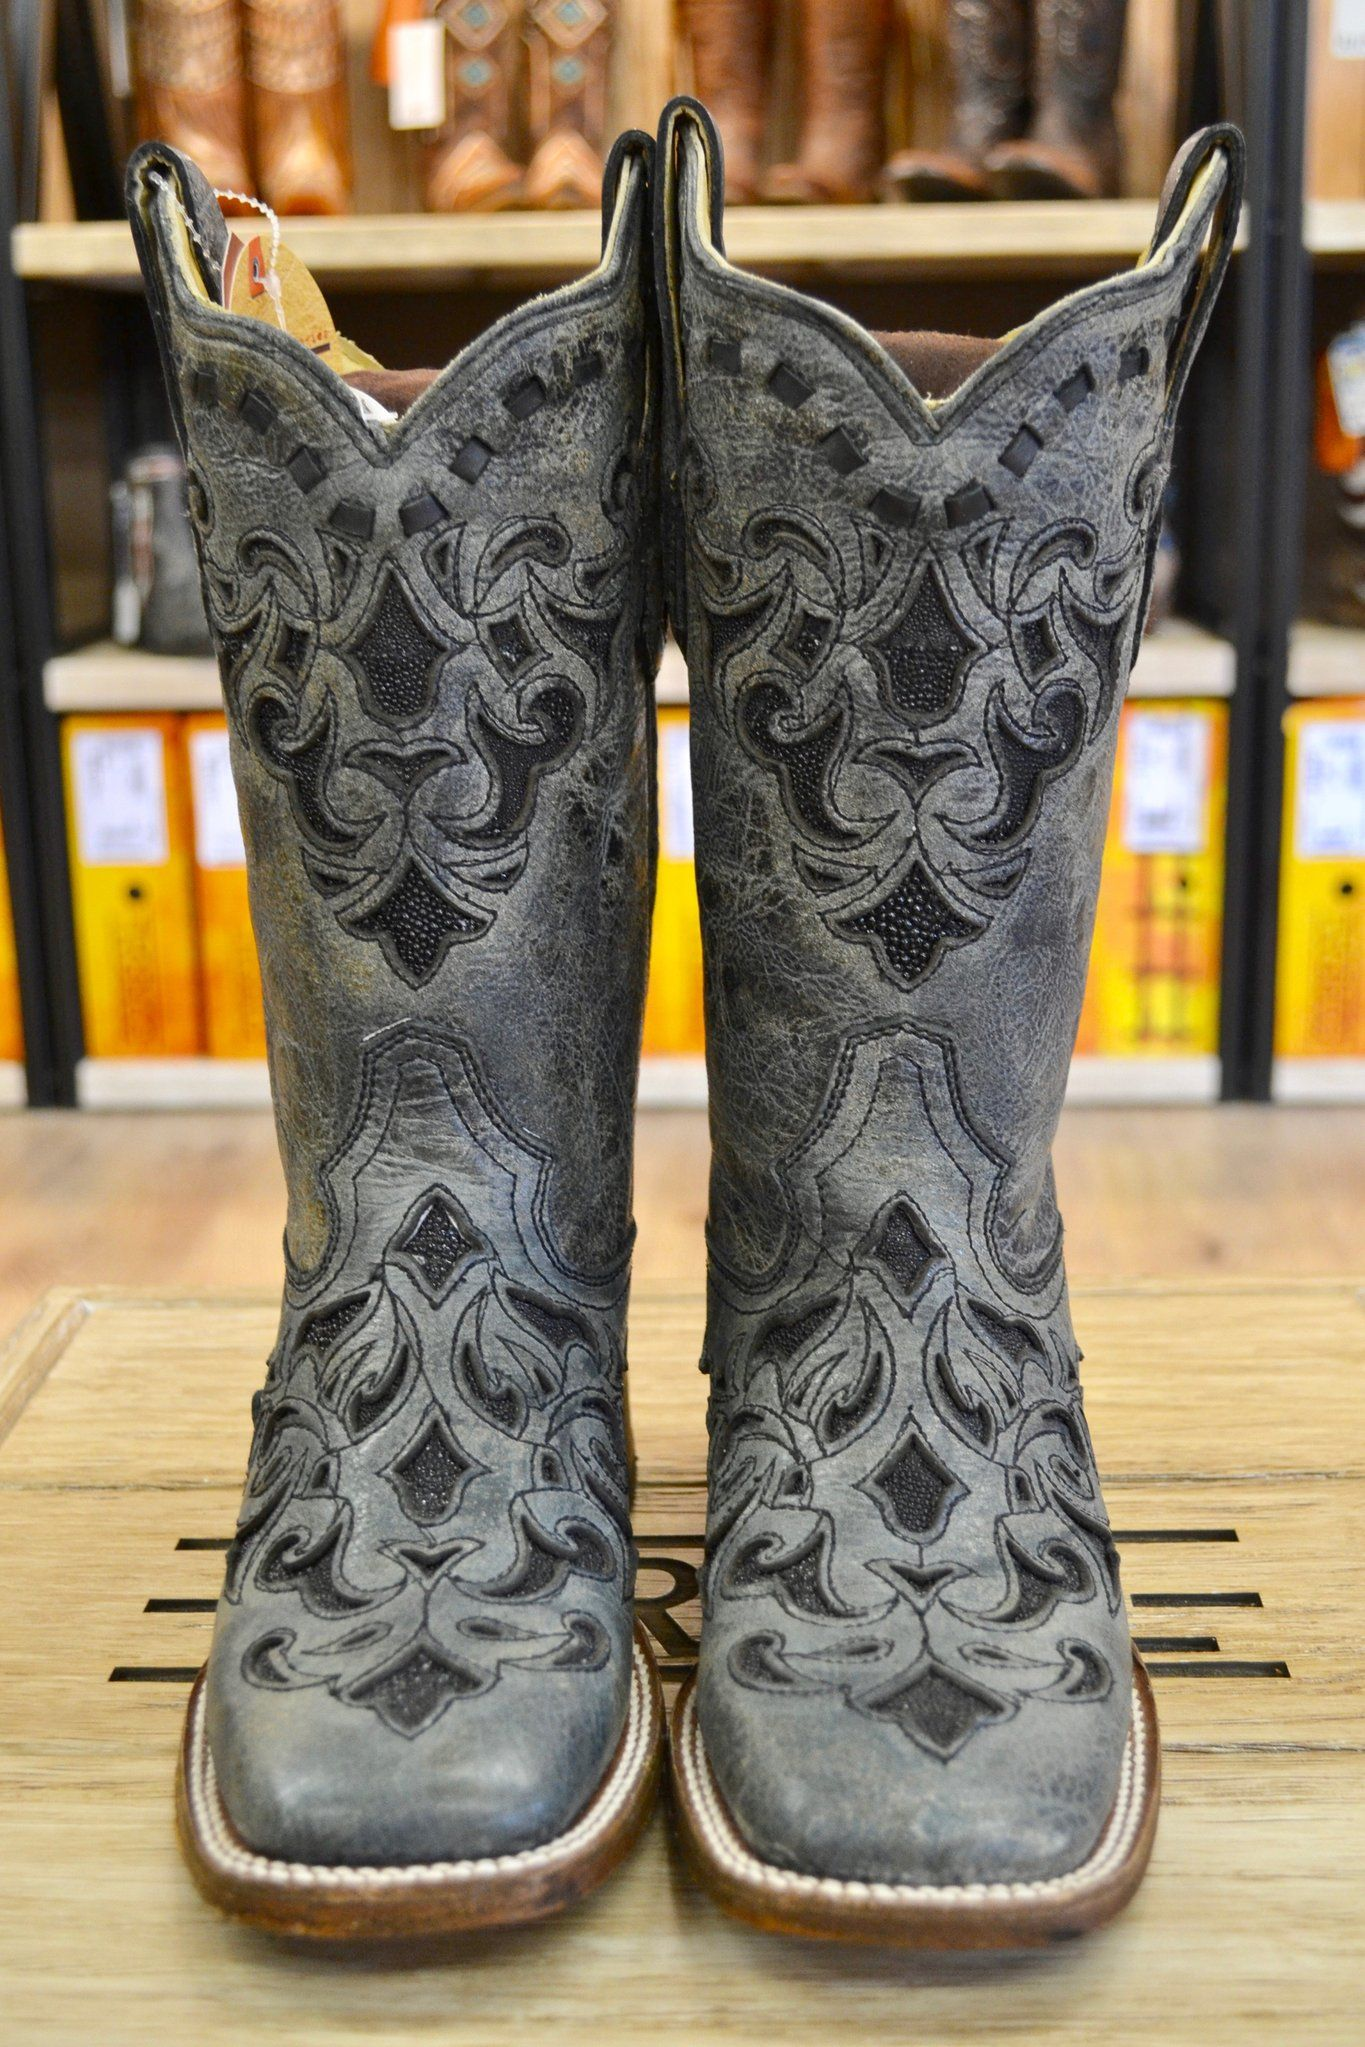 fb2217b4466 Corral Women's Gray & Black Stingray Inlay Square Toe Cowgirl Boots ...